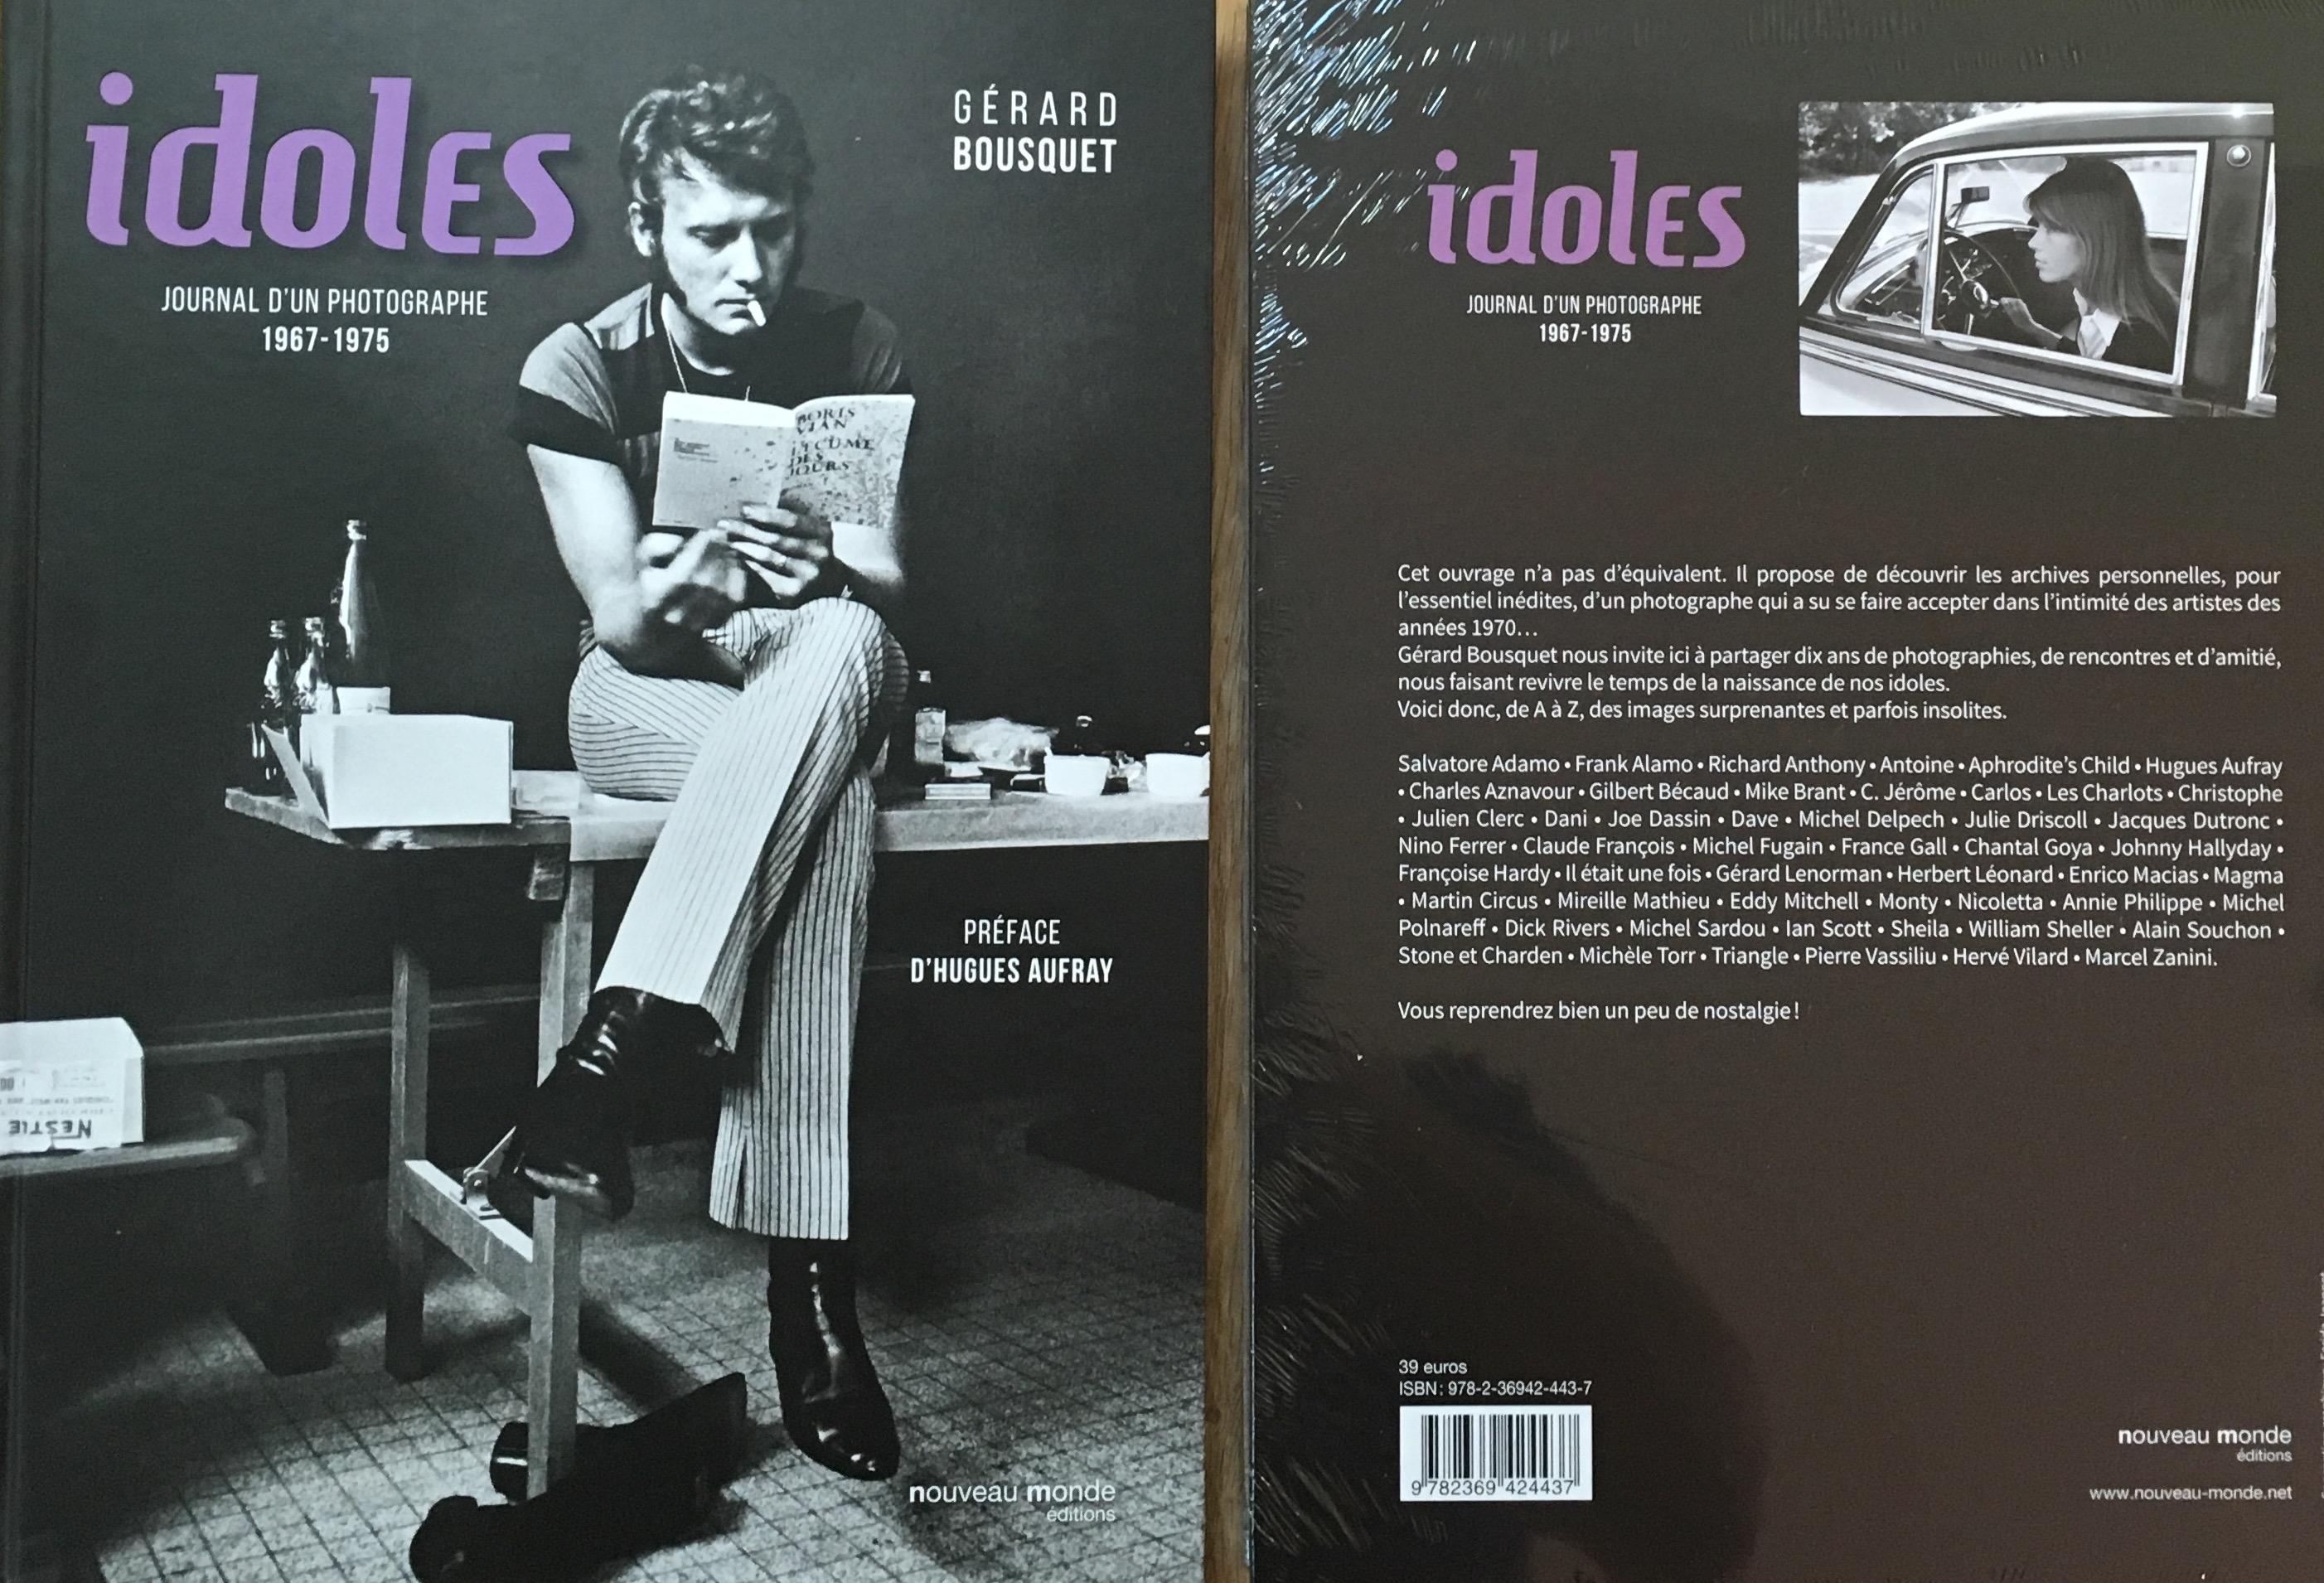 Livre photos «Idoles» Gerard Bousquet